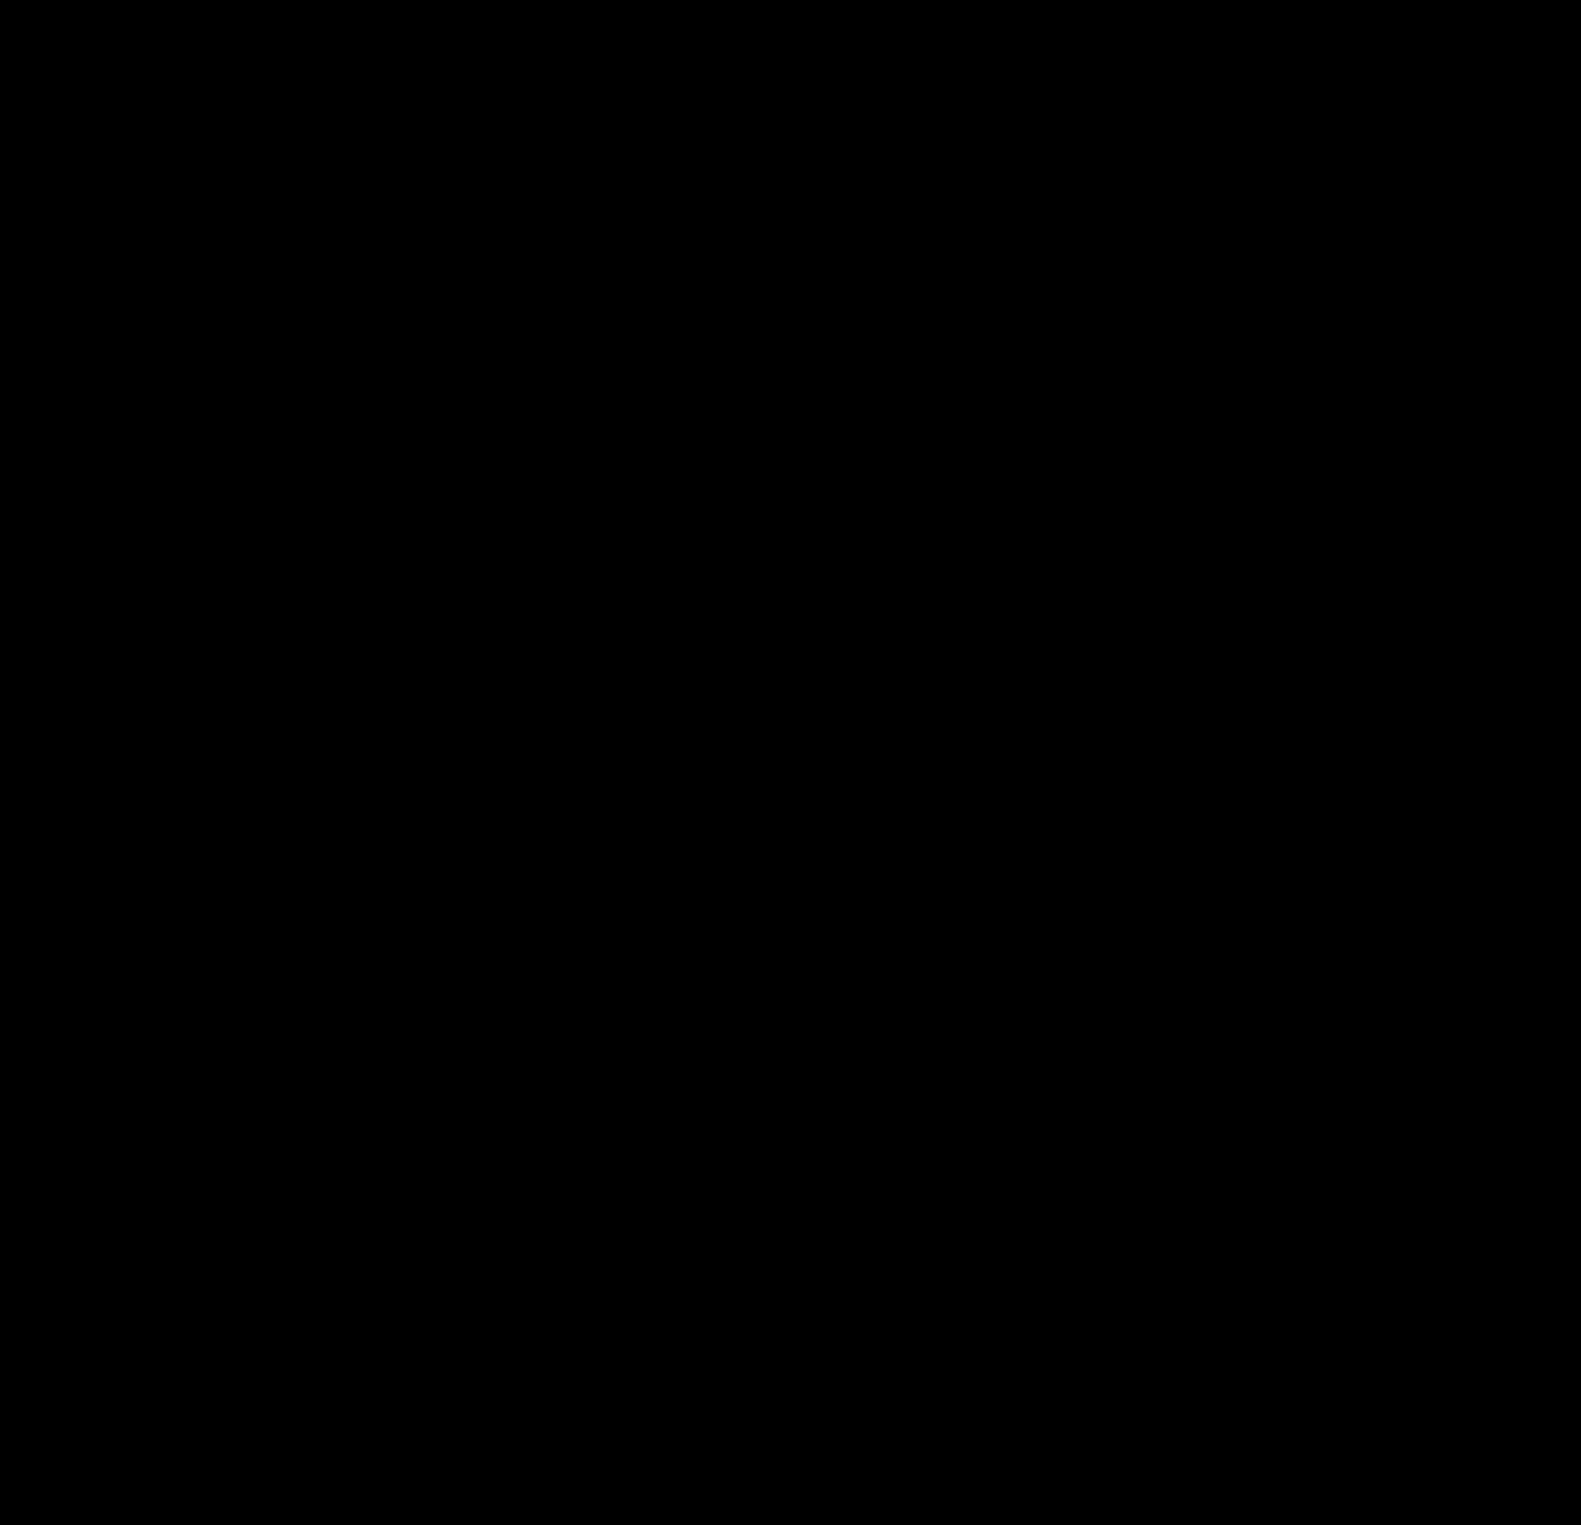 transparent black circle - HD1581×1525